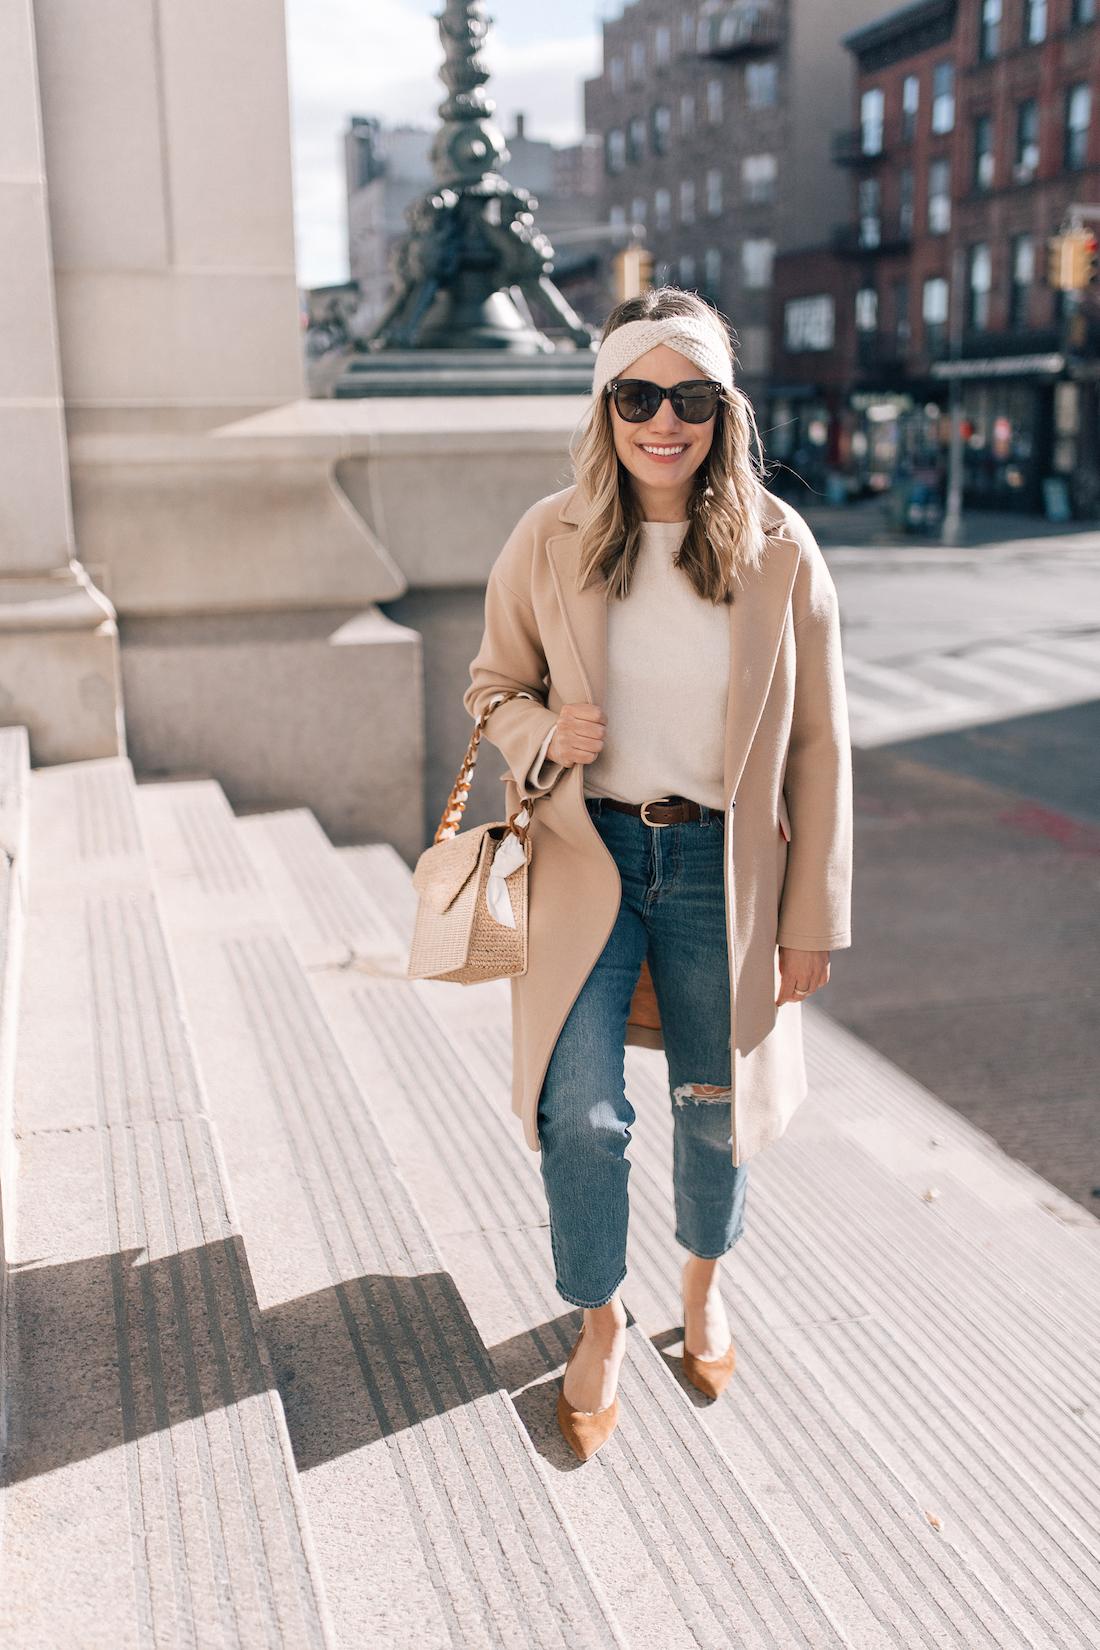 Grace Atwood Outfit Details:Topshop Coat(exact) // Eileen Fisher Sweater(c/o) // Eileen Fisher Headband (c/o)// Levi's Jeans // Polaroid Sunglasses // Pamela Munson Bag (c/o) // Sarah Flint Heels // J.Crew Belt